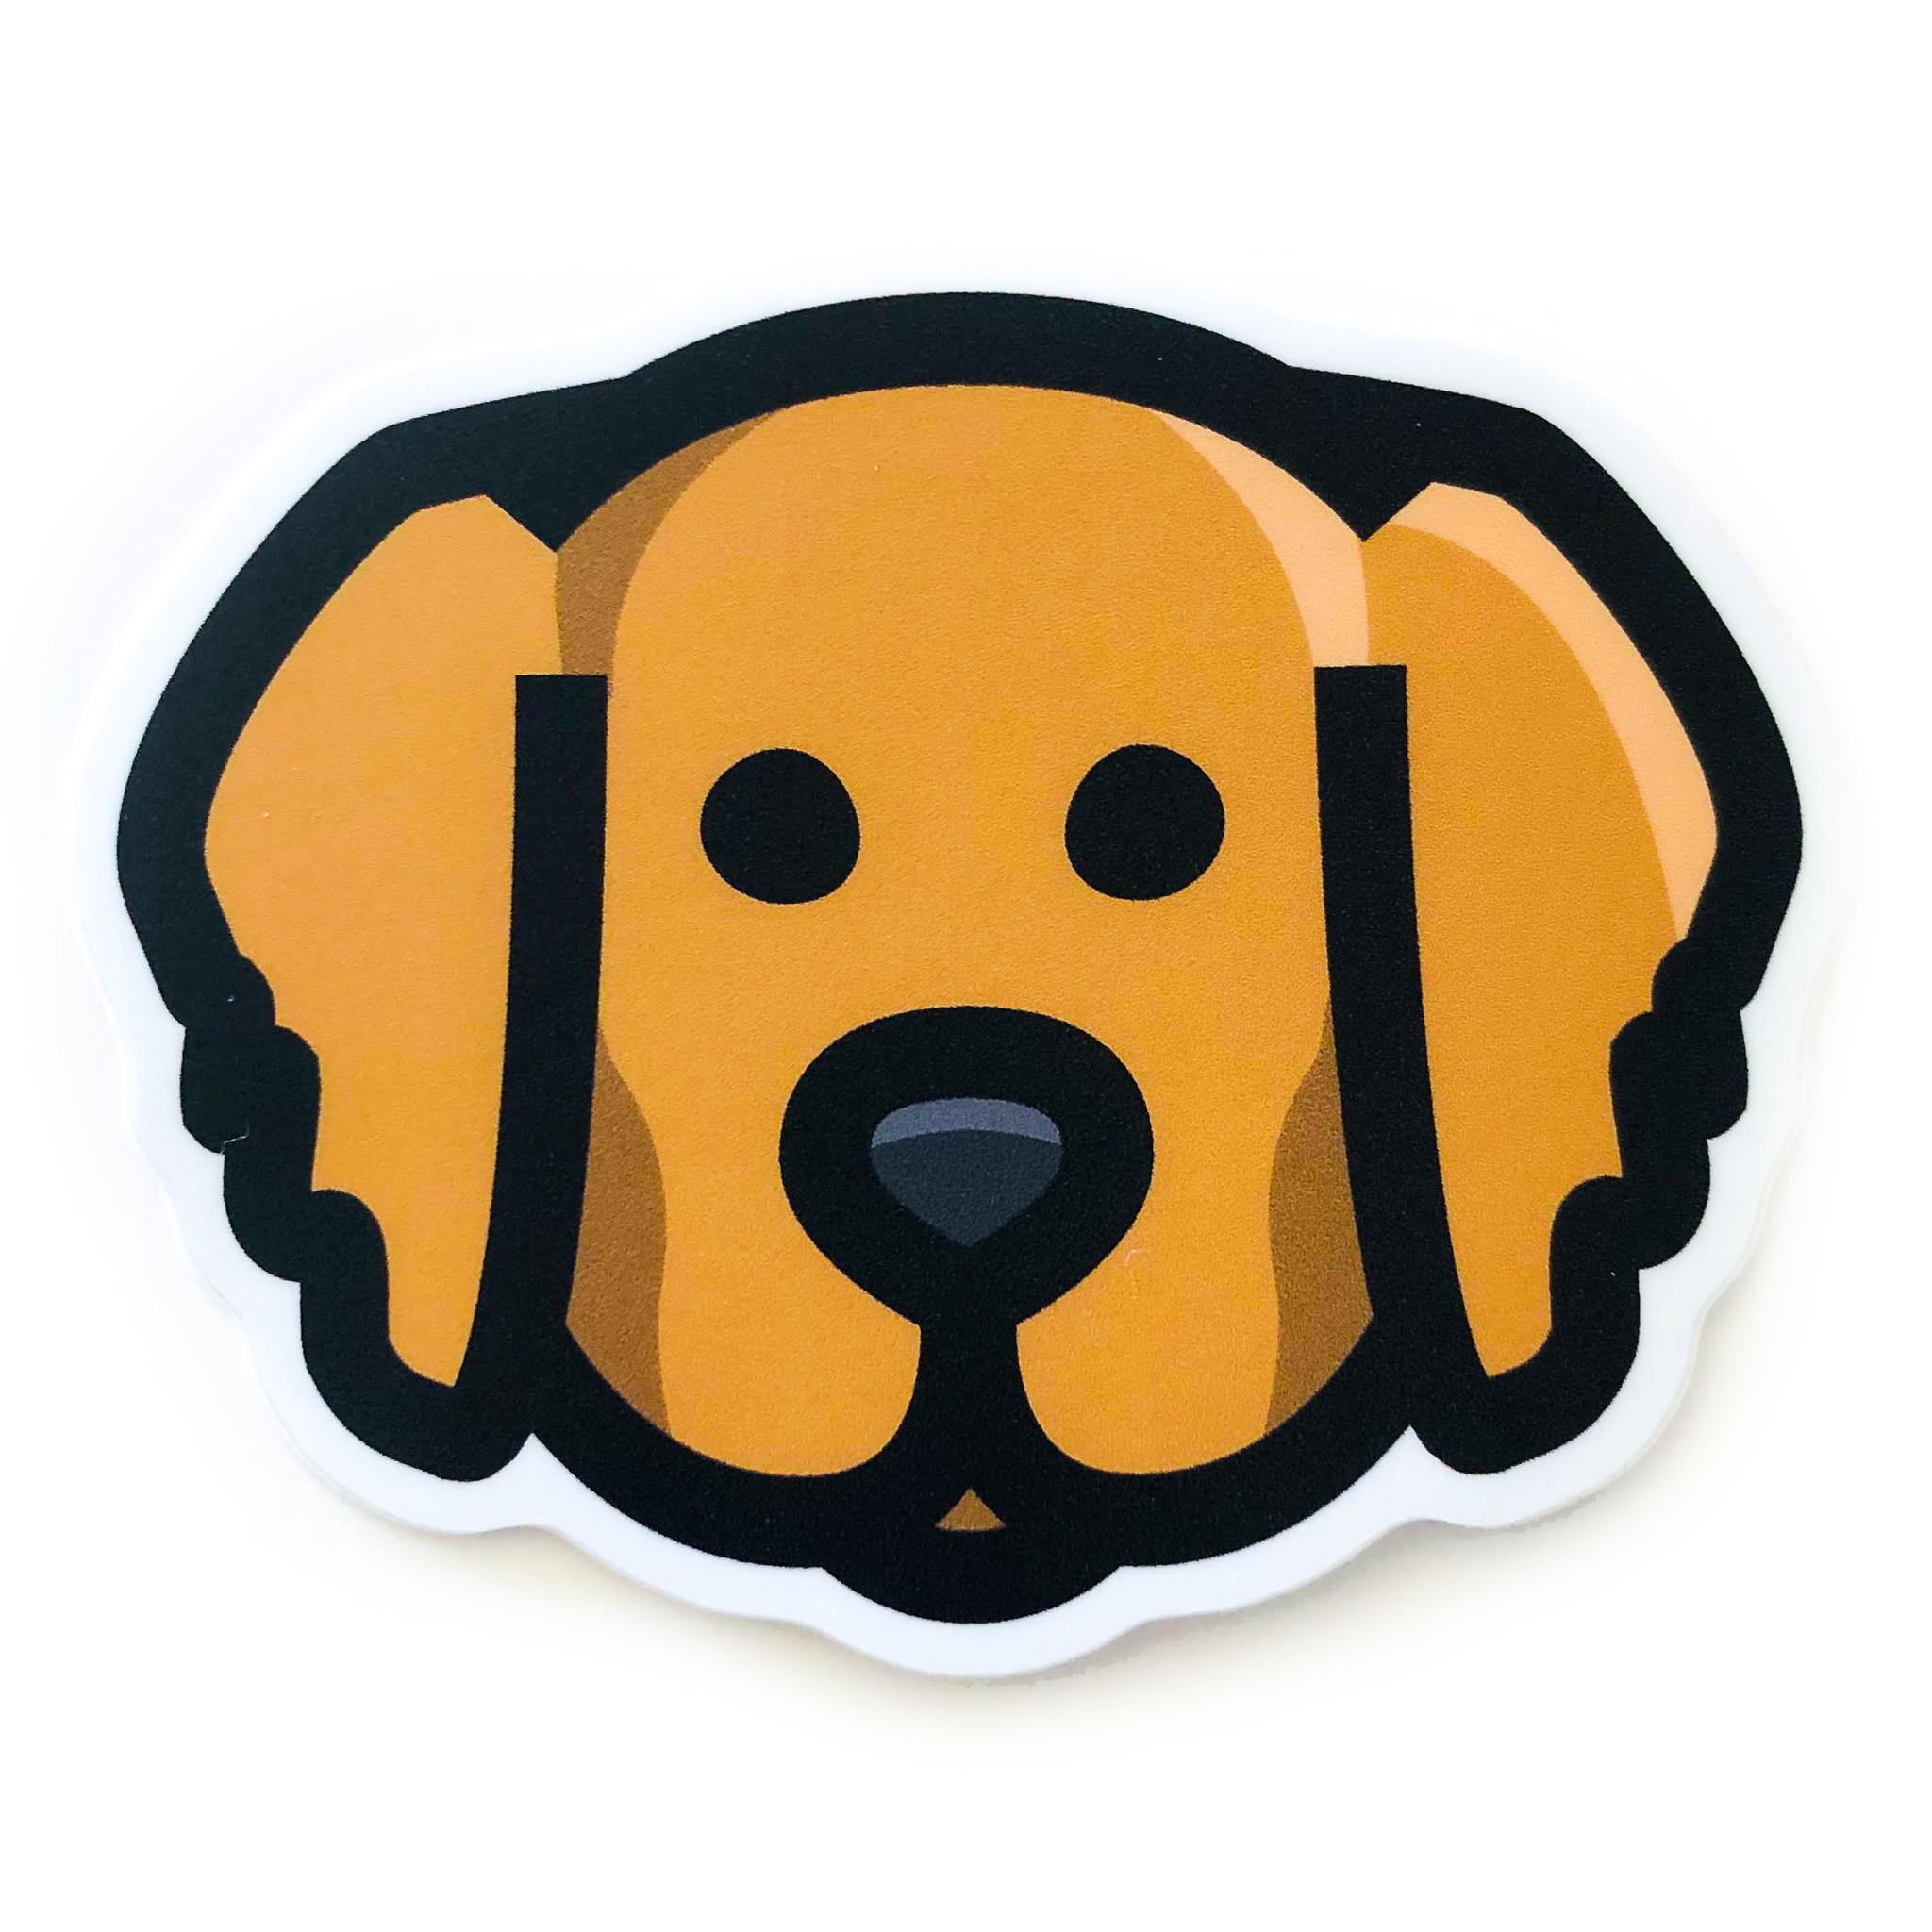 Sticker Golden Retriever Face Plenty Mercantile Venue